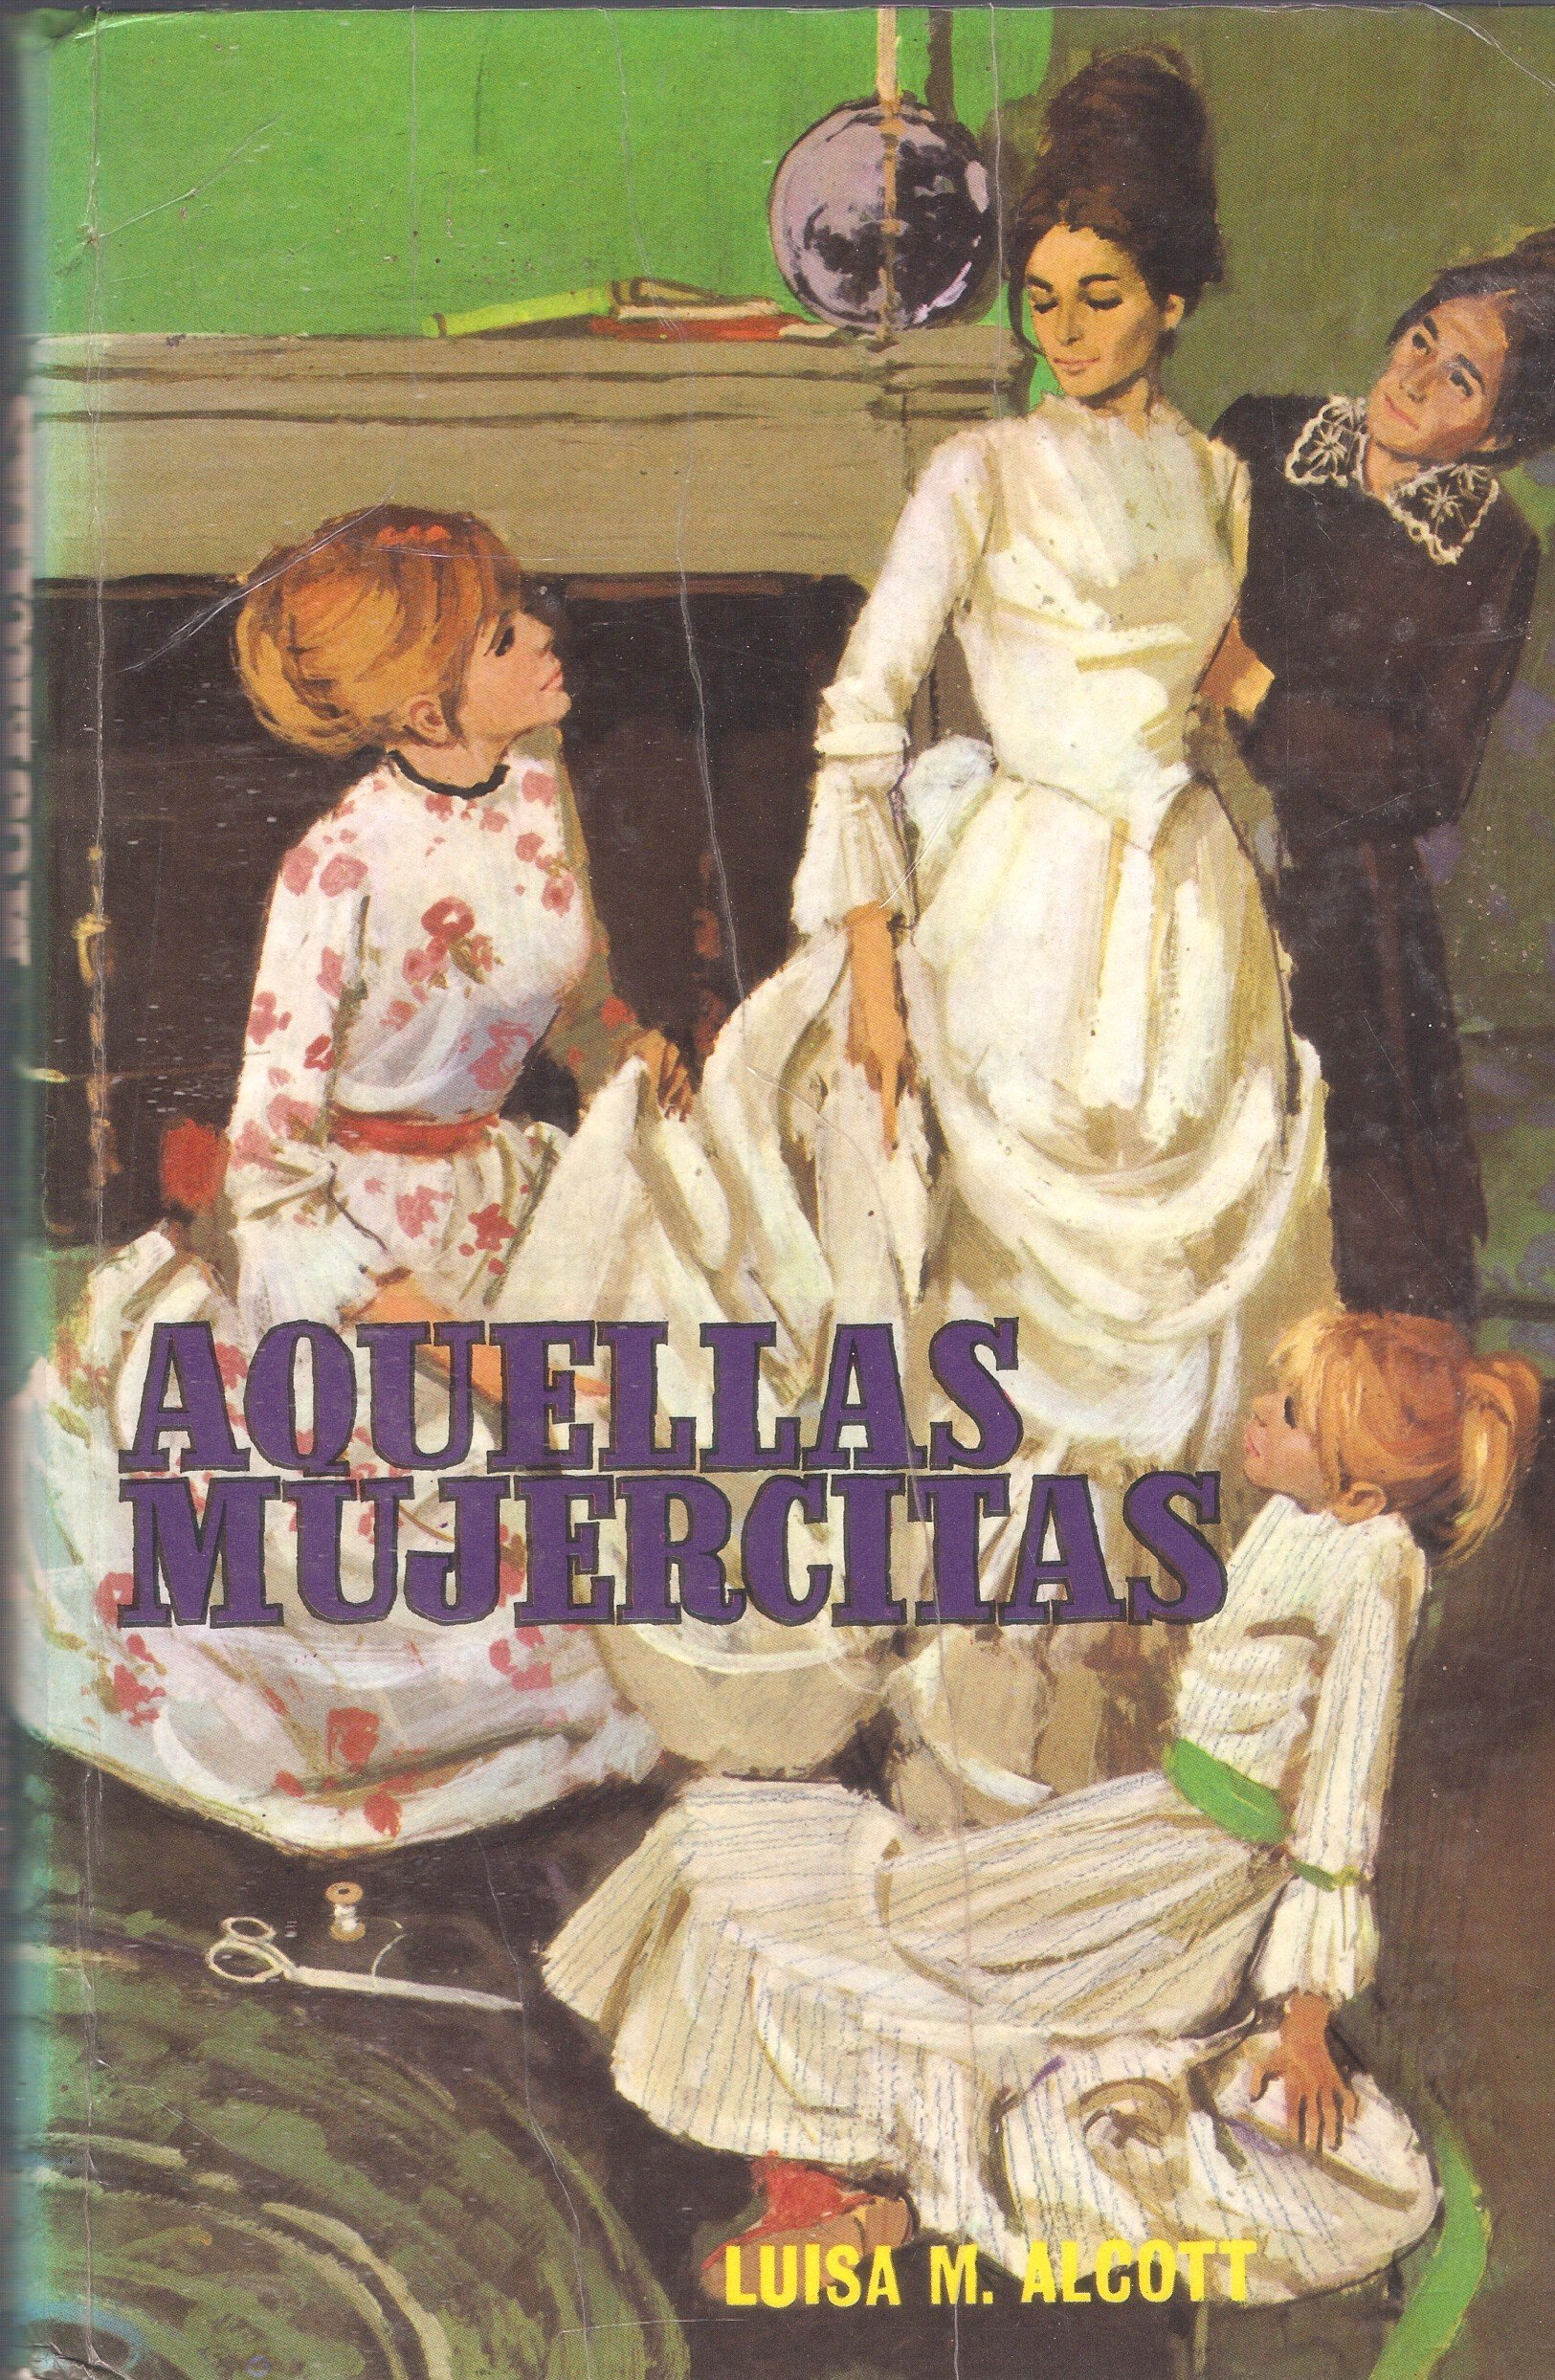 Aquellas mujercitas: Amazon.es: Luisa M. Alcott, Novela Juvenil ...